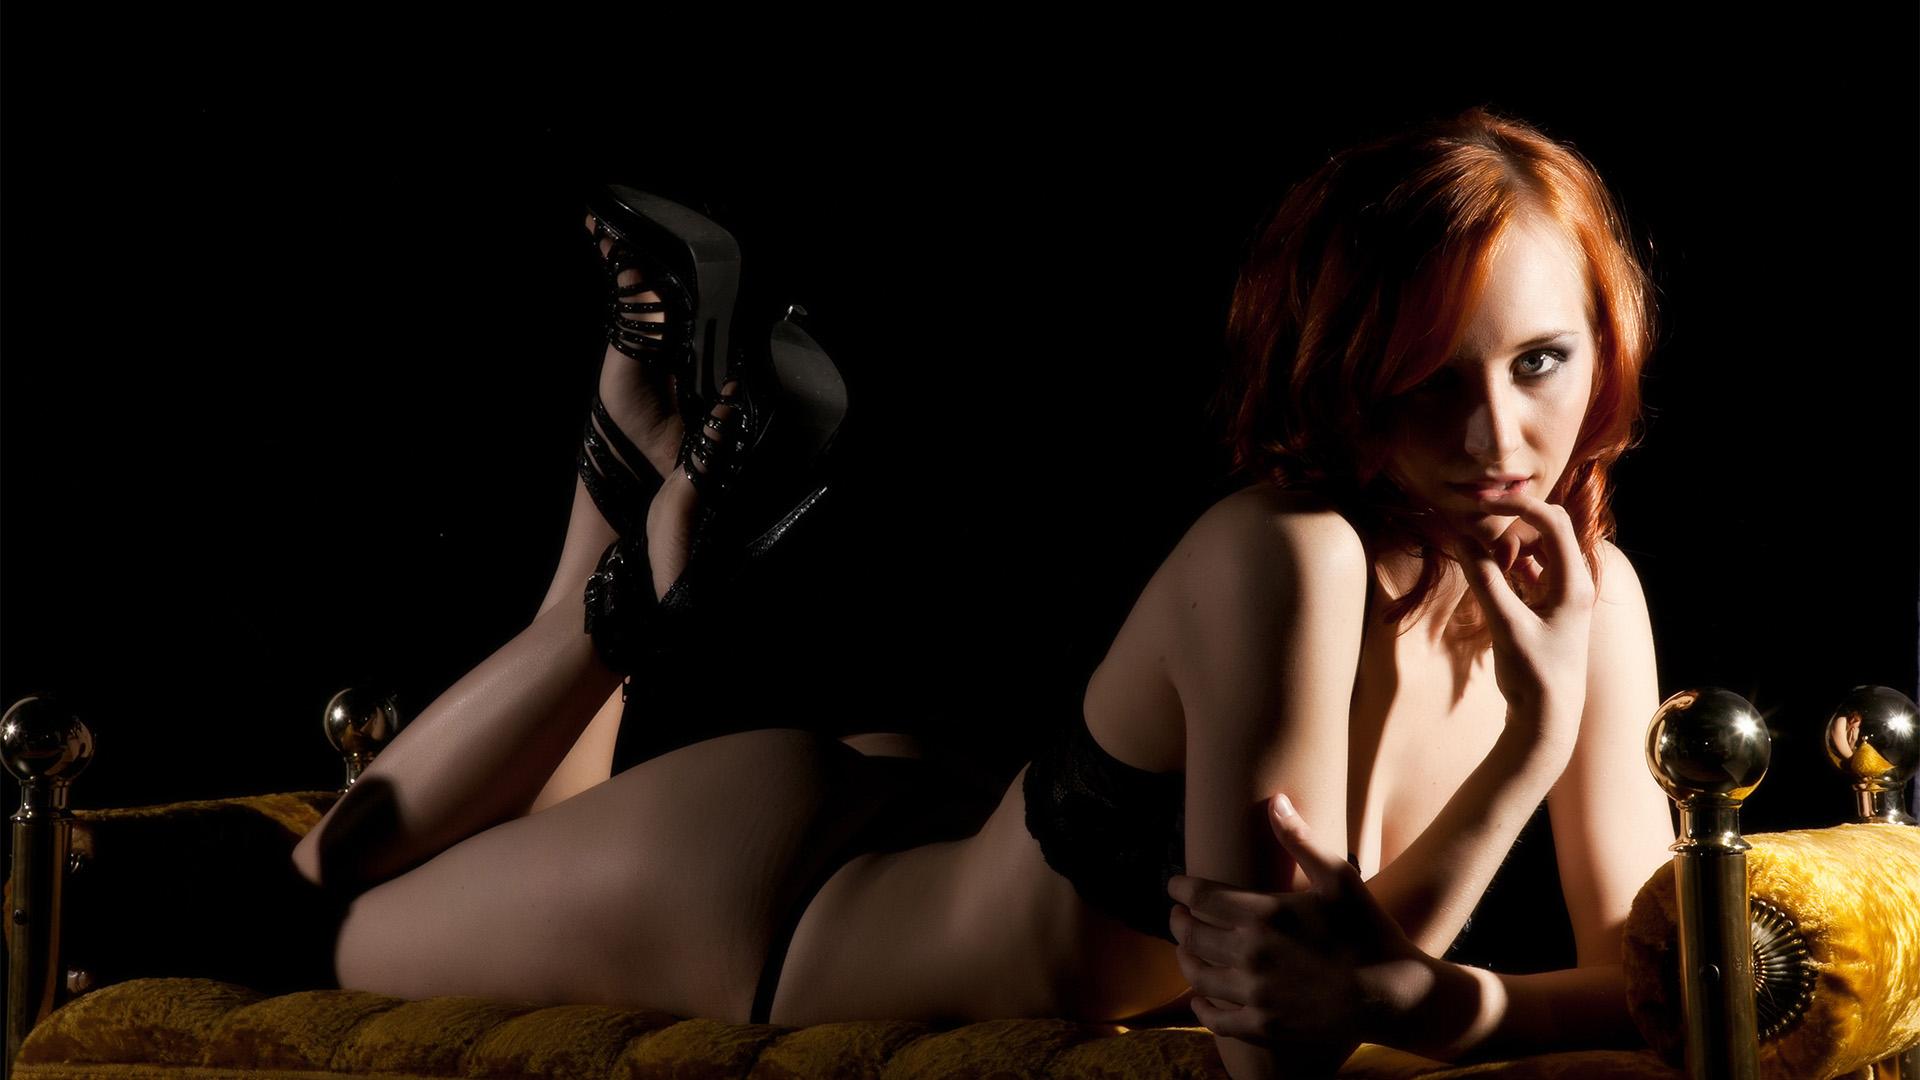 naughty-veephoto